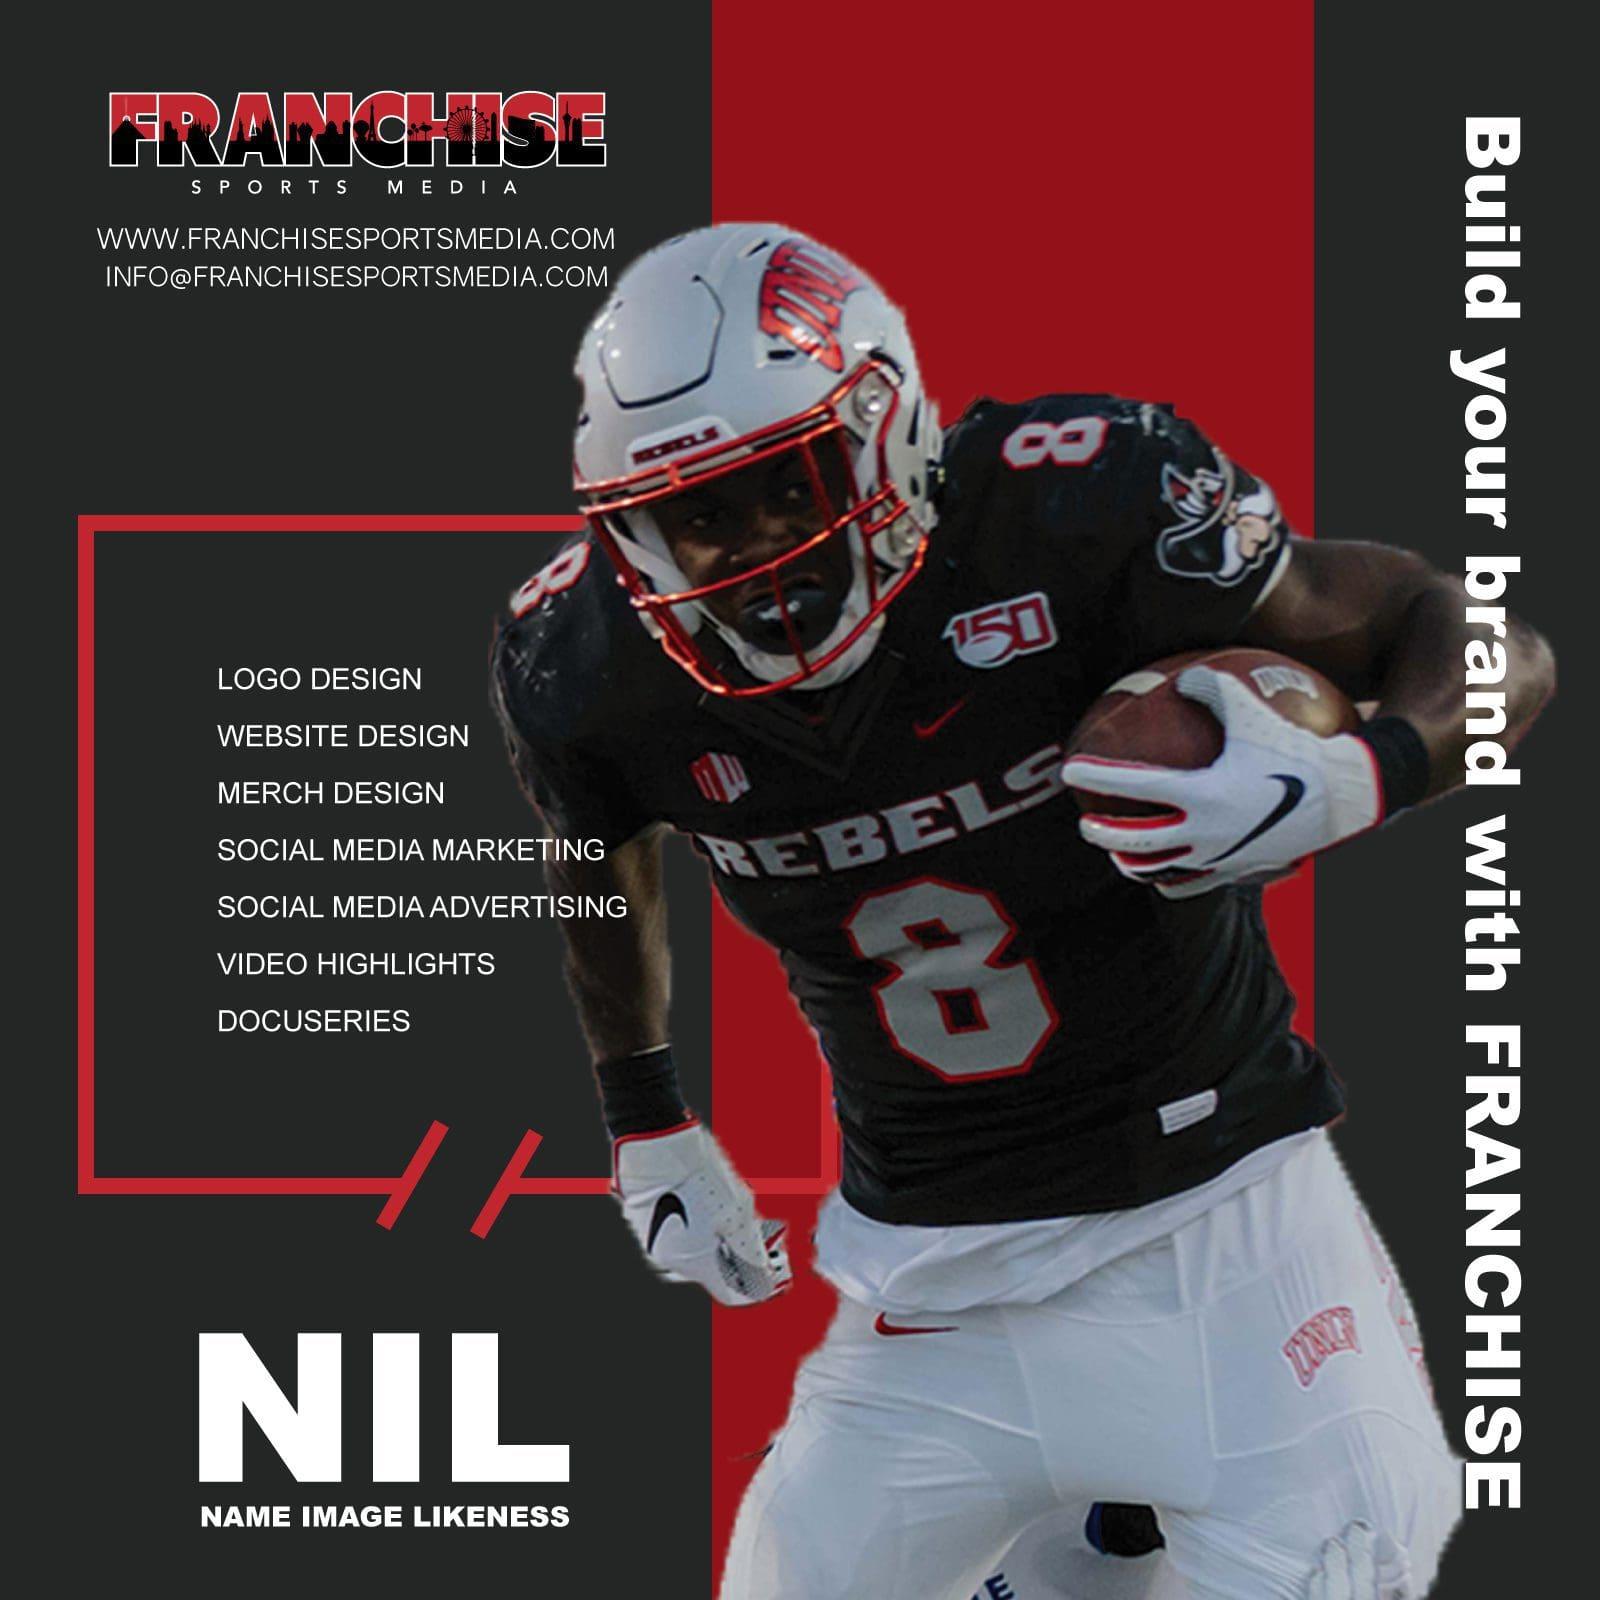 NIL - Name Image Likeness Franchise Sports Media